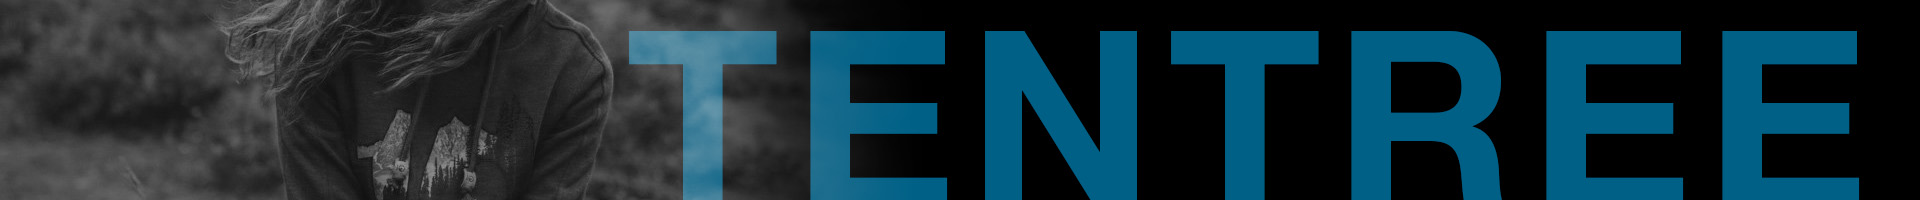 TENTREE - MEN'S & WOMEN'S CASUAL APPAREL